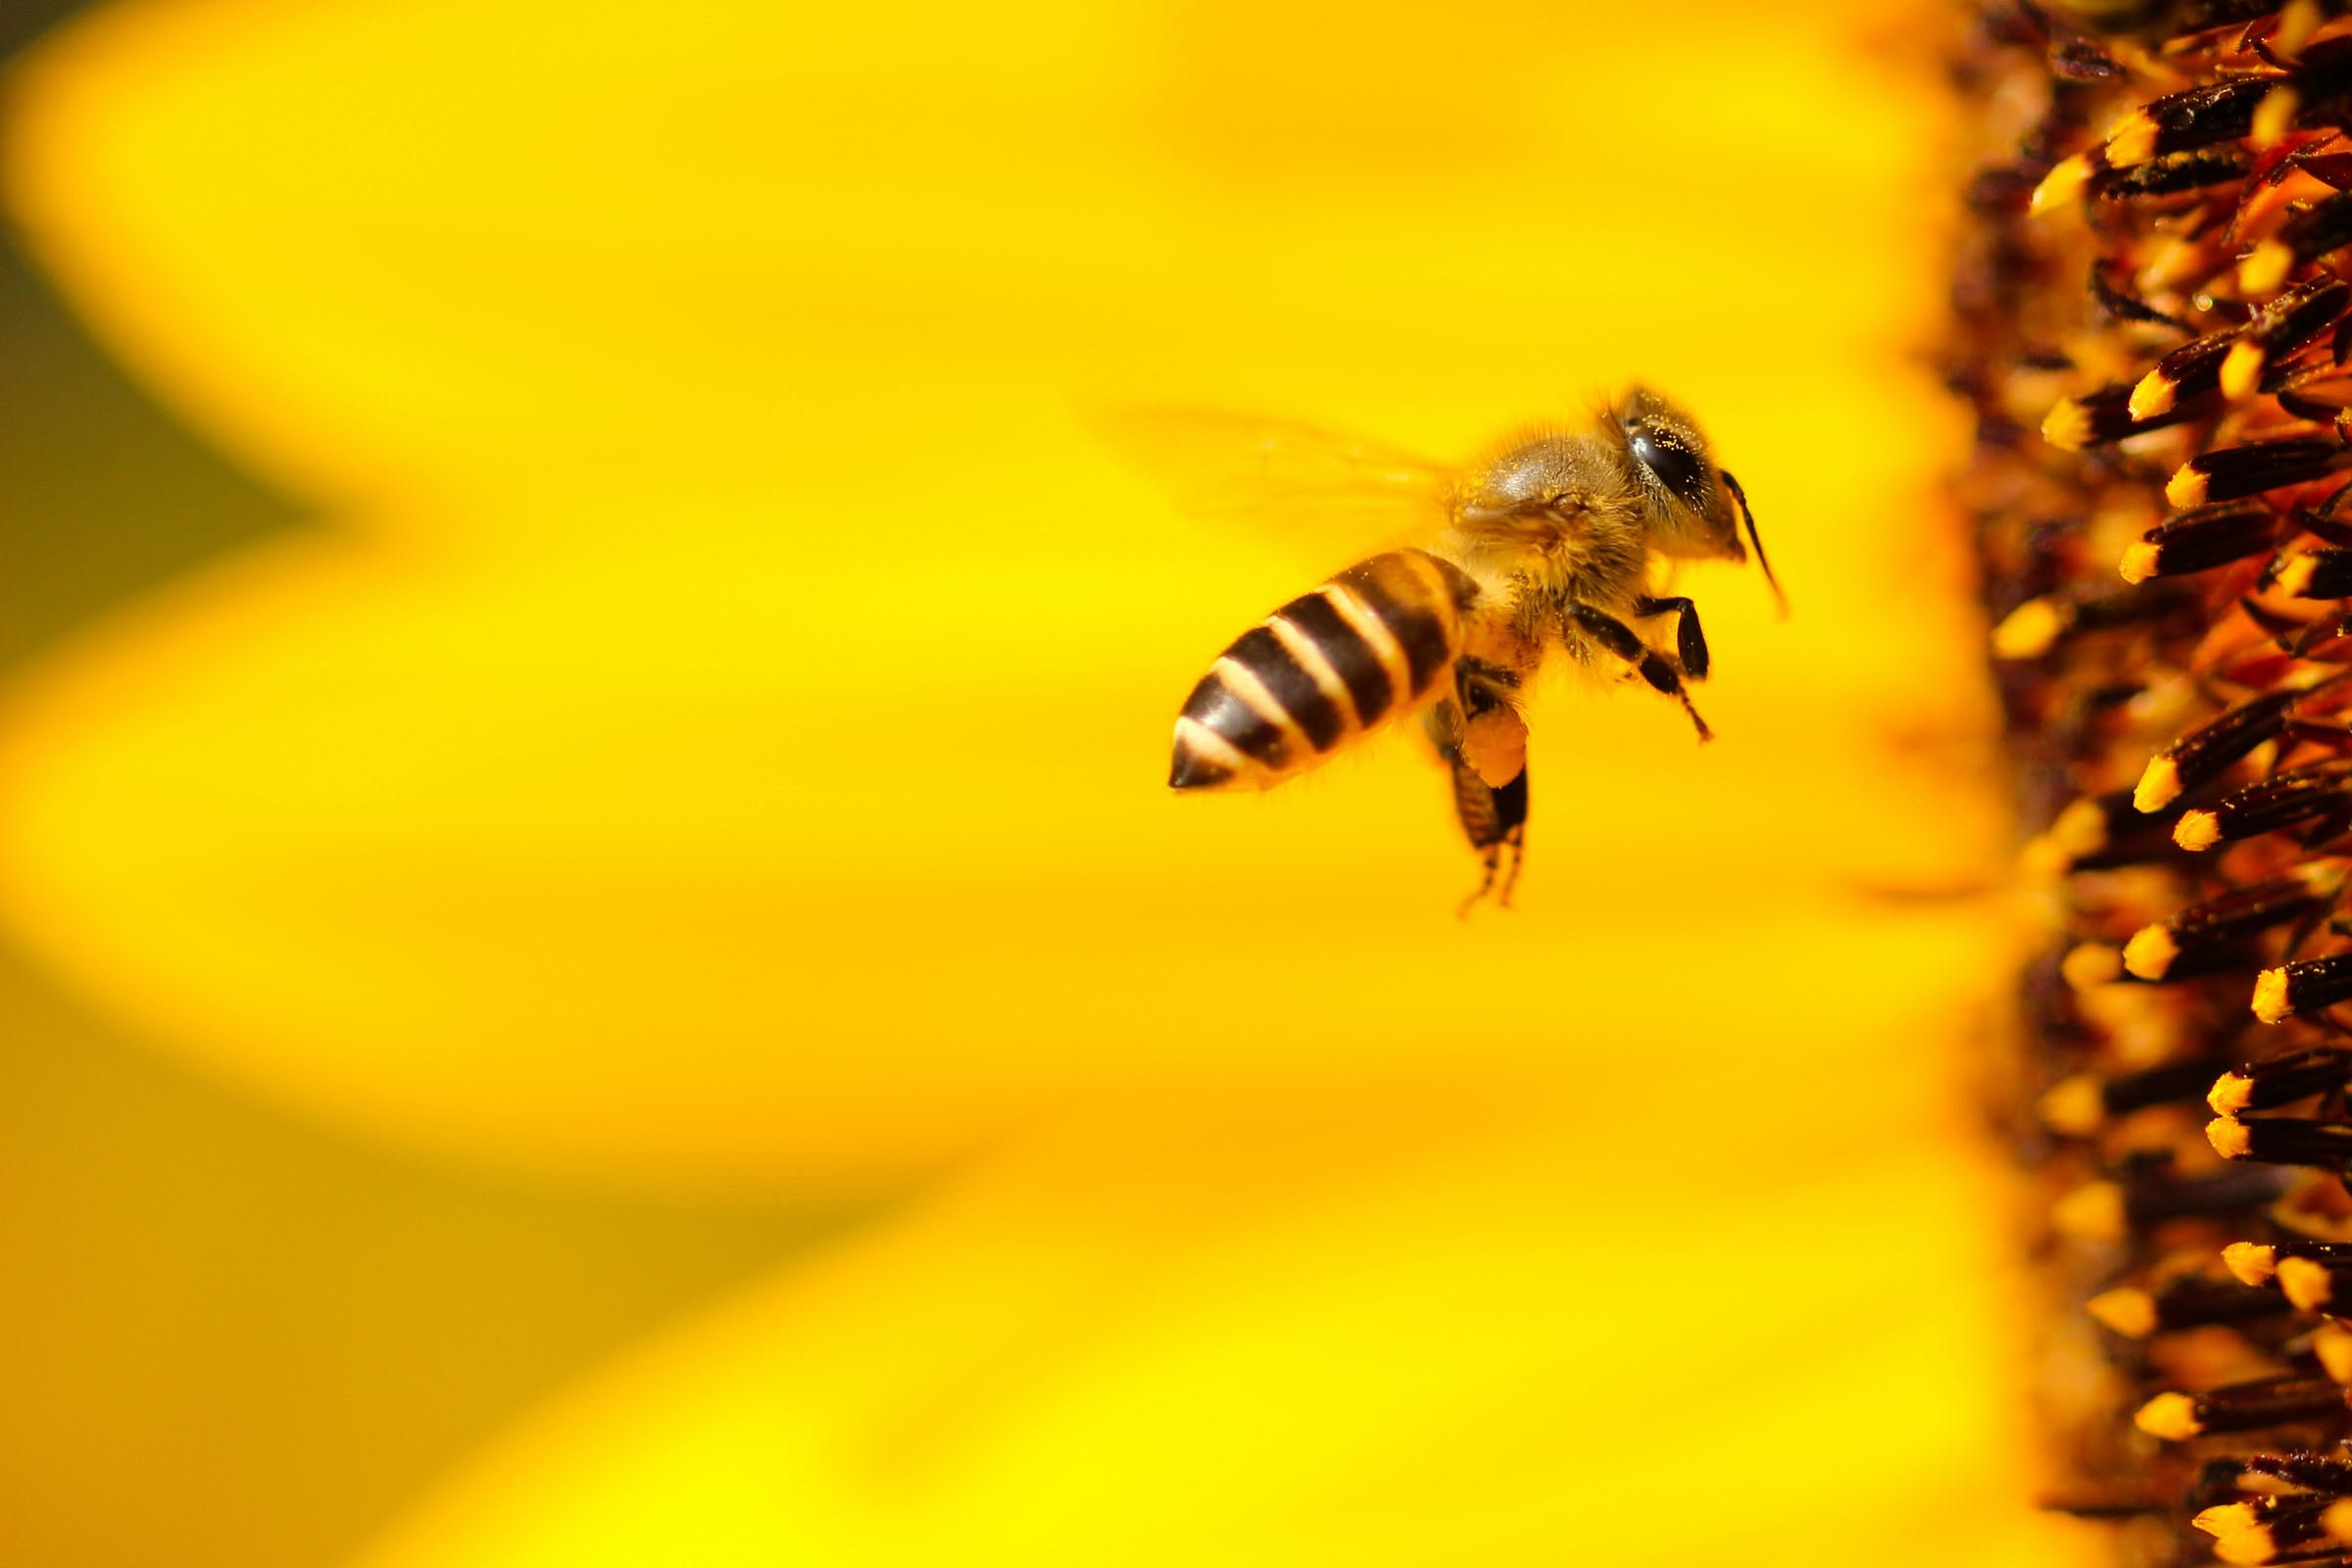 A macro photo of a bee near a sunflower.